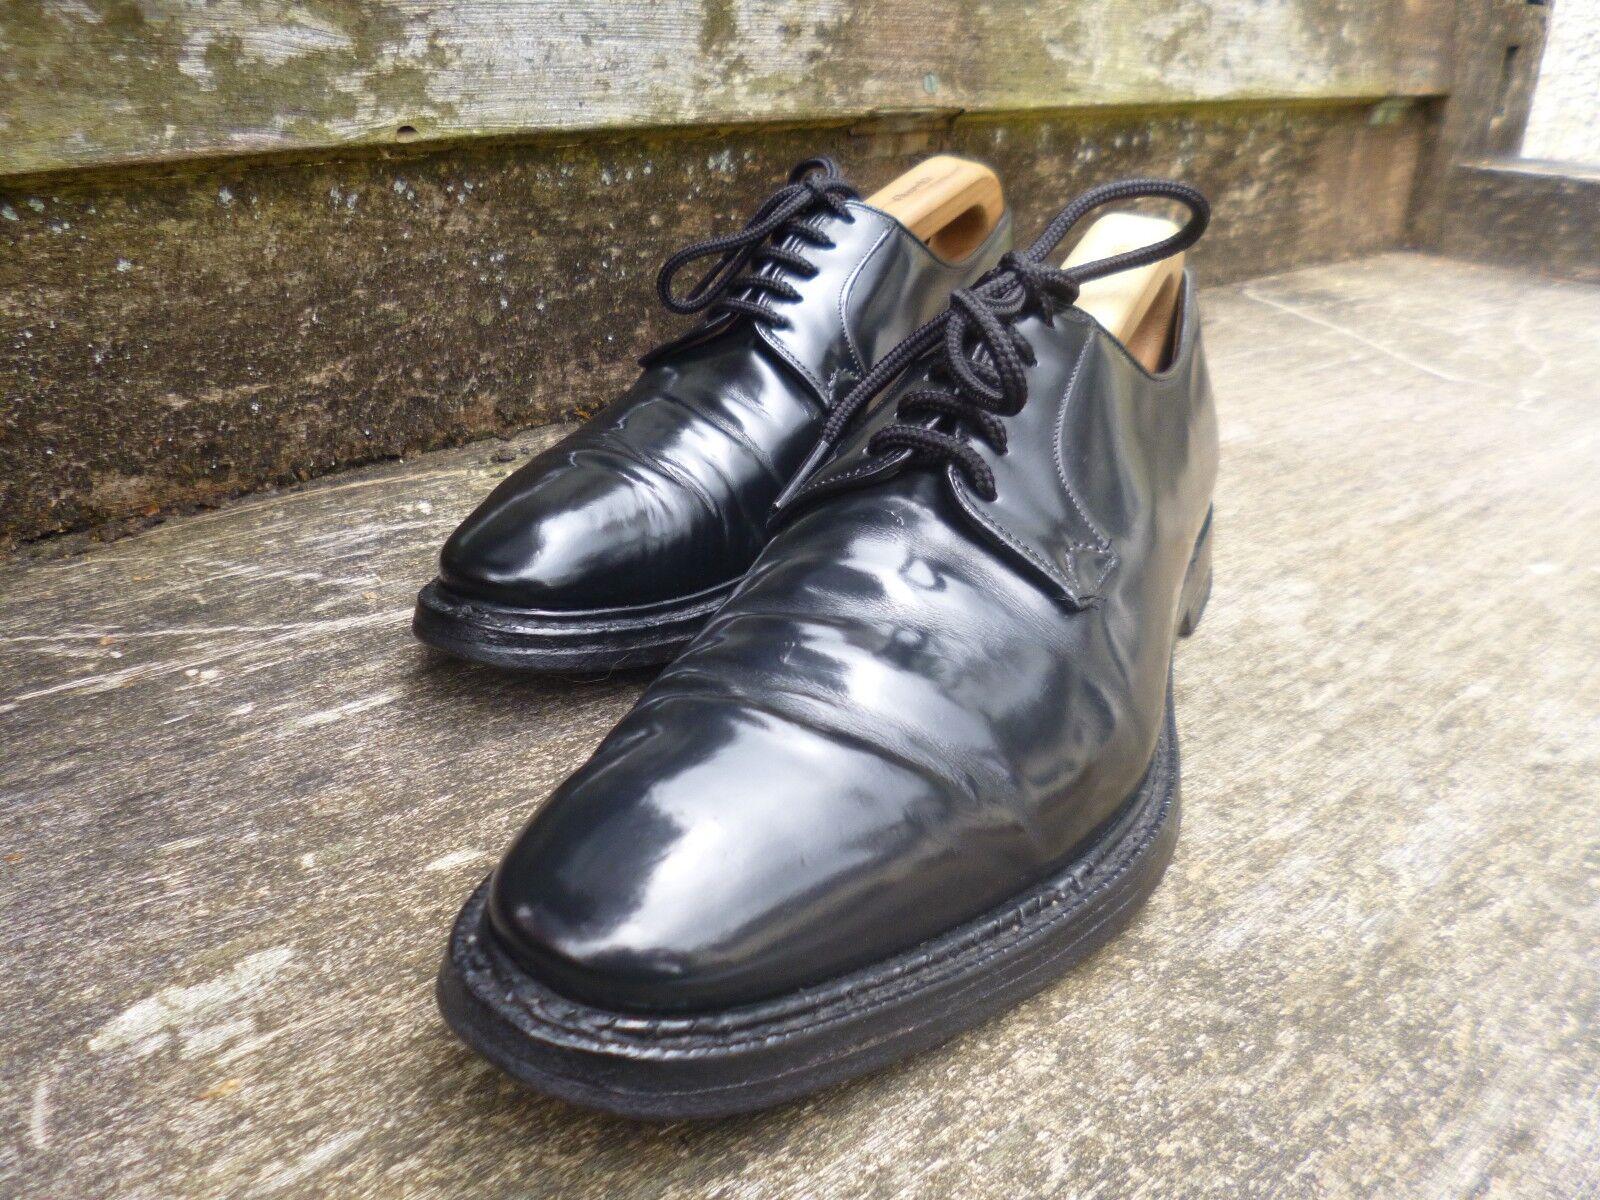 CHURCH scarpe derby – Nero – – – – Bern – Ottime condizioni